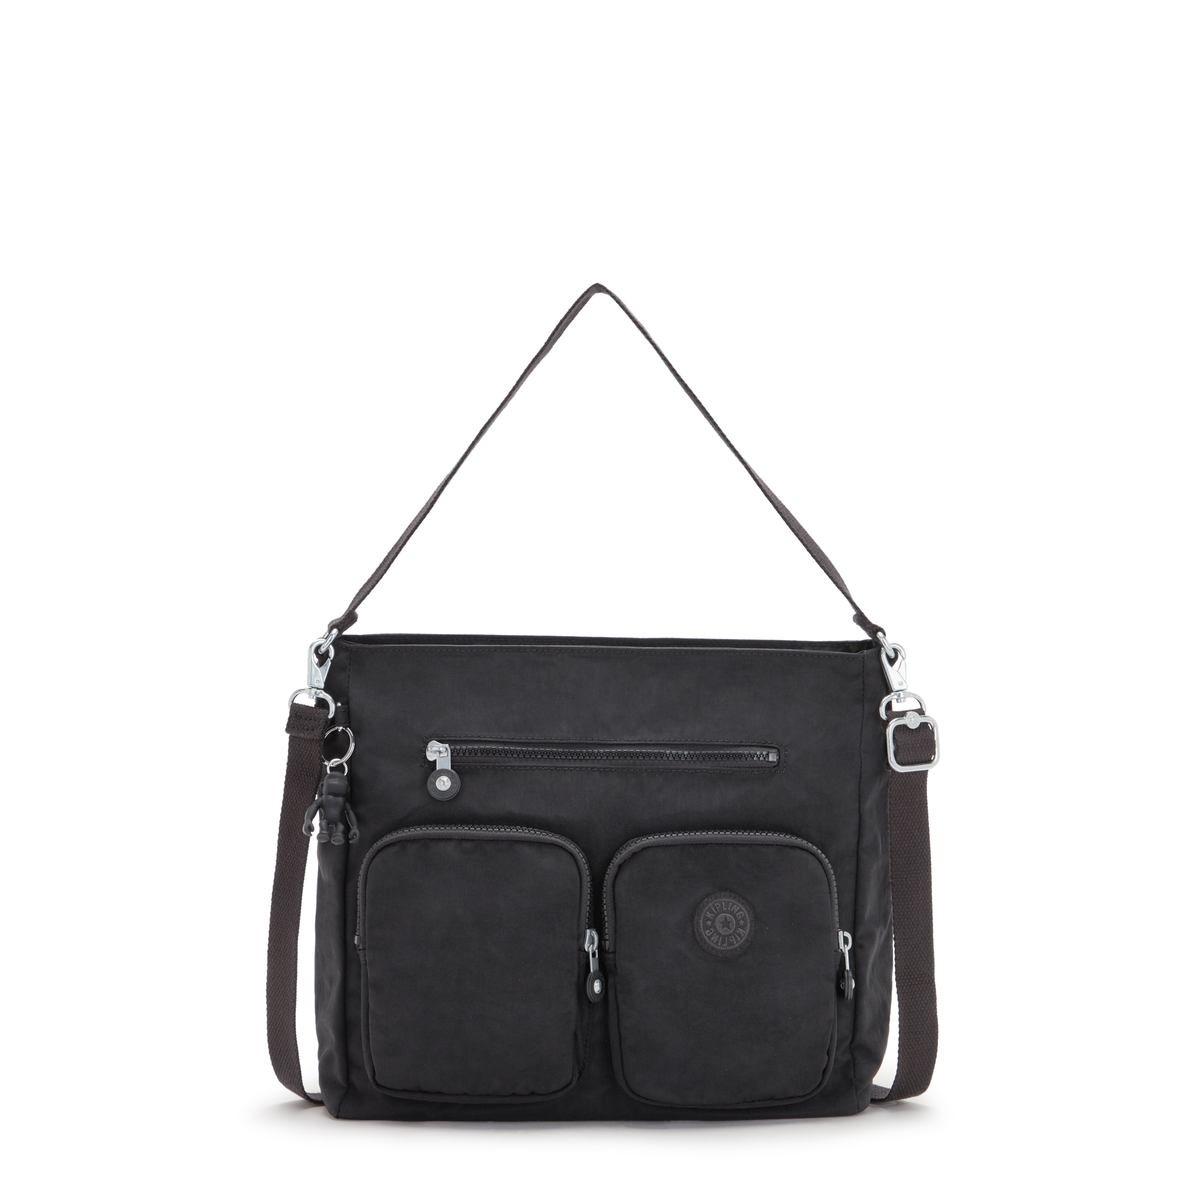 Kipling Τσάντα Ώμου 31x29x4cm Tasmo Black